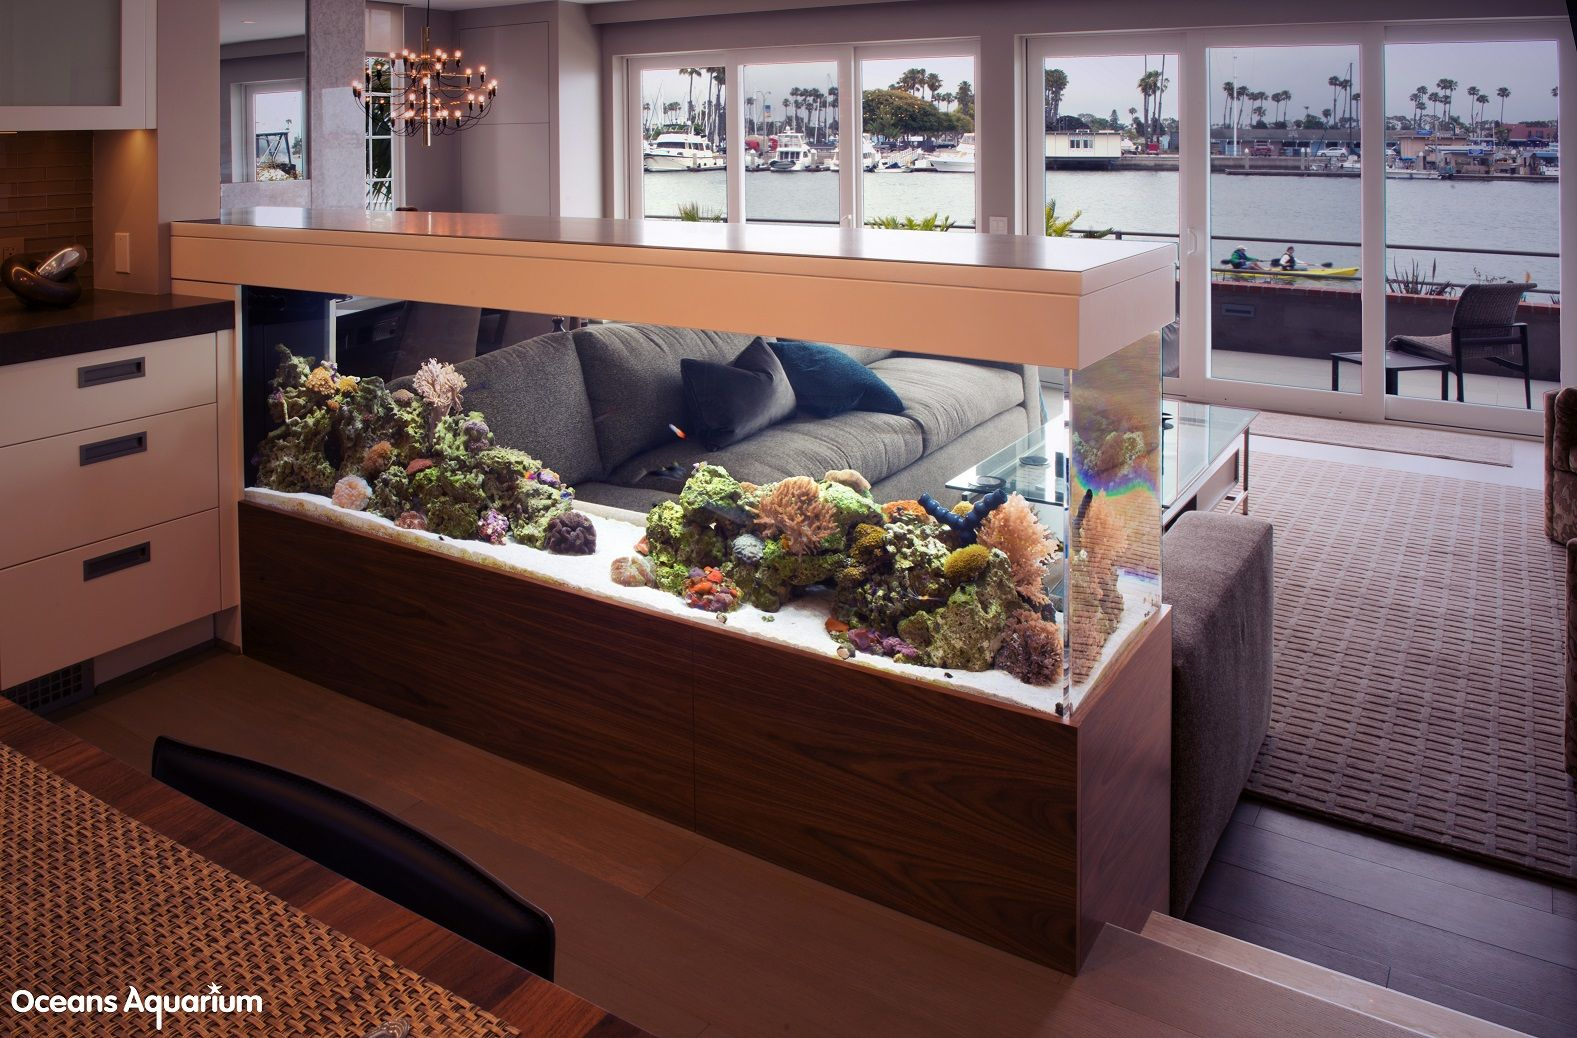 Living Room Decorating Ideas Fish Tank 200 gallon living reef custom aquarium. room divider peninsula